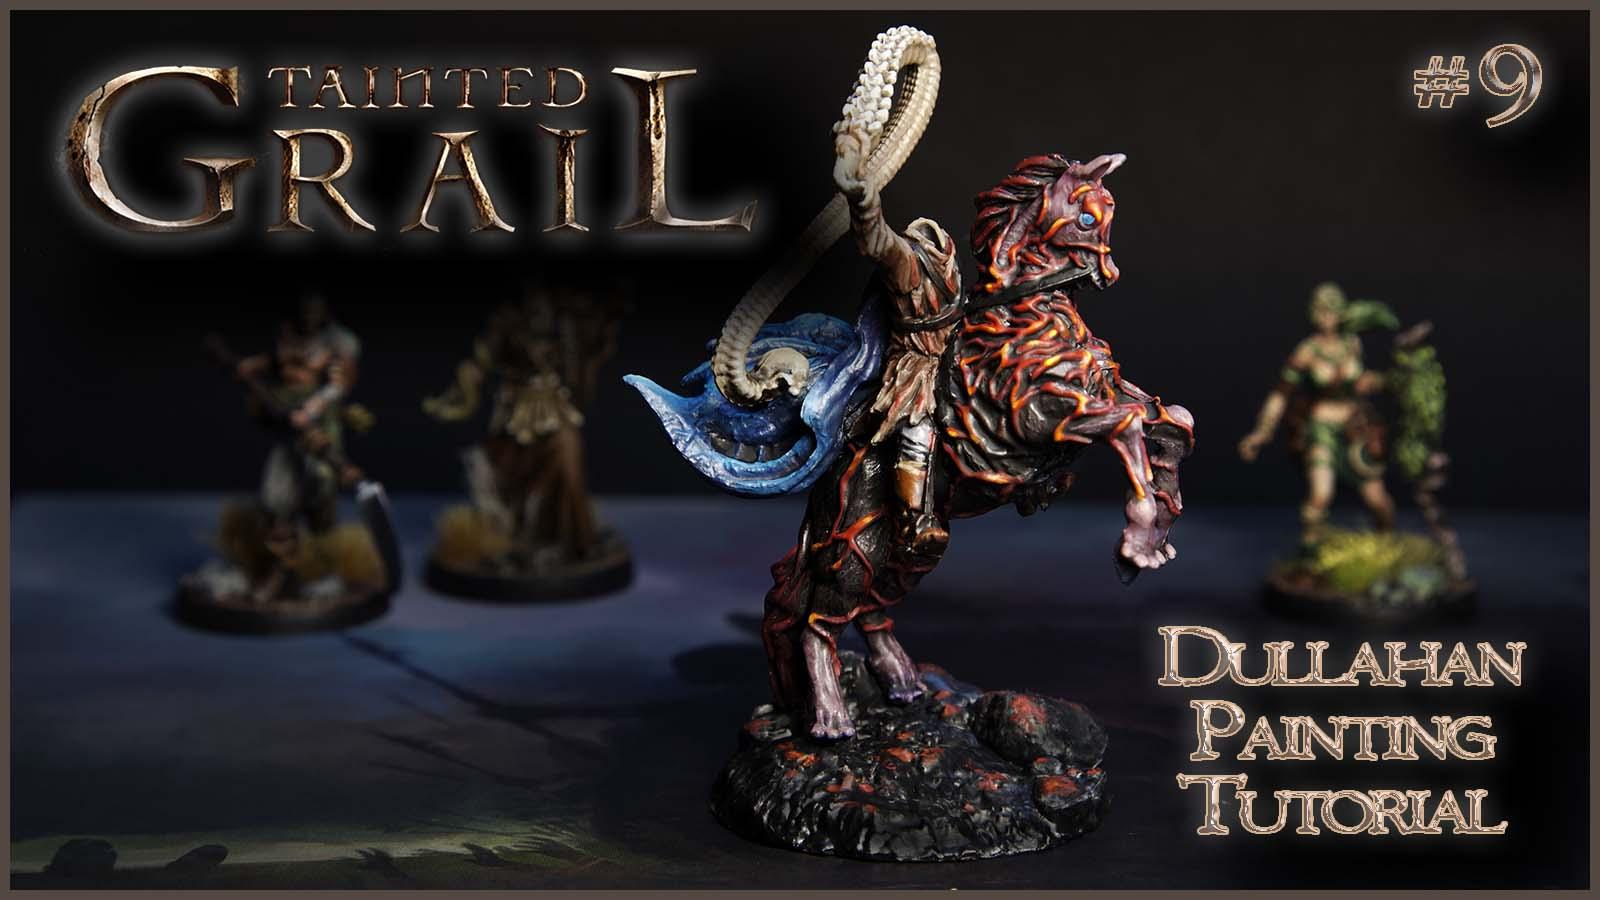 Kiki's Miniatures Mania – Tainted Grail ep.9 – Come dipingere il Dullahan